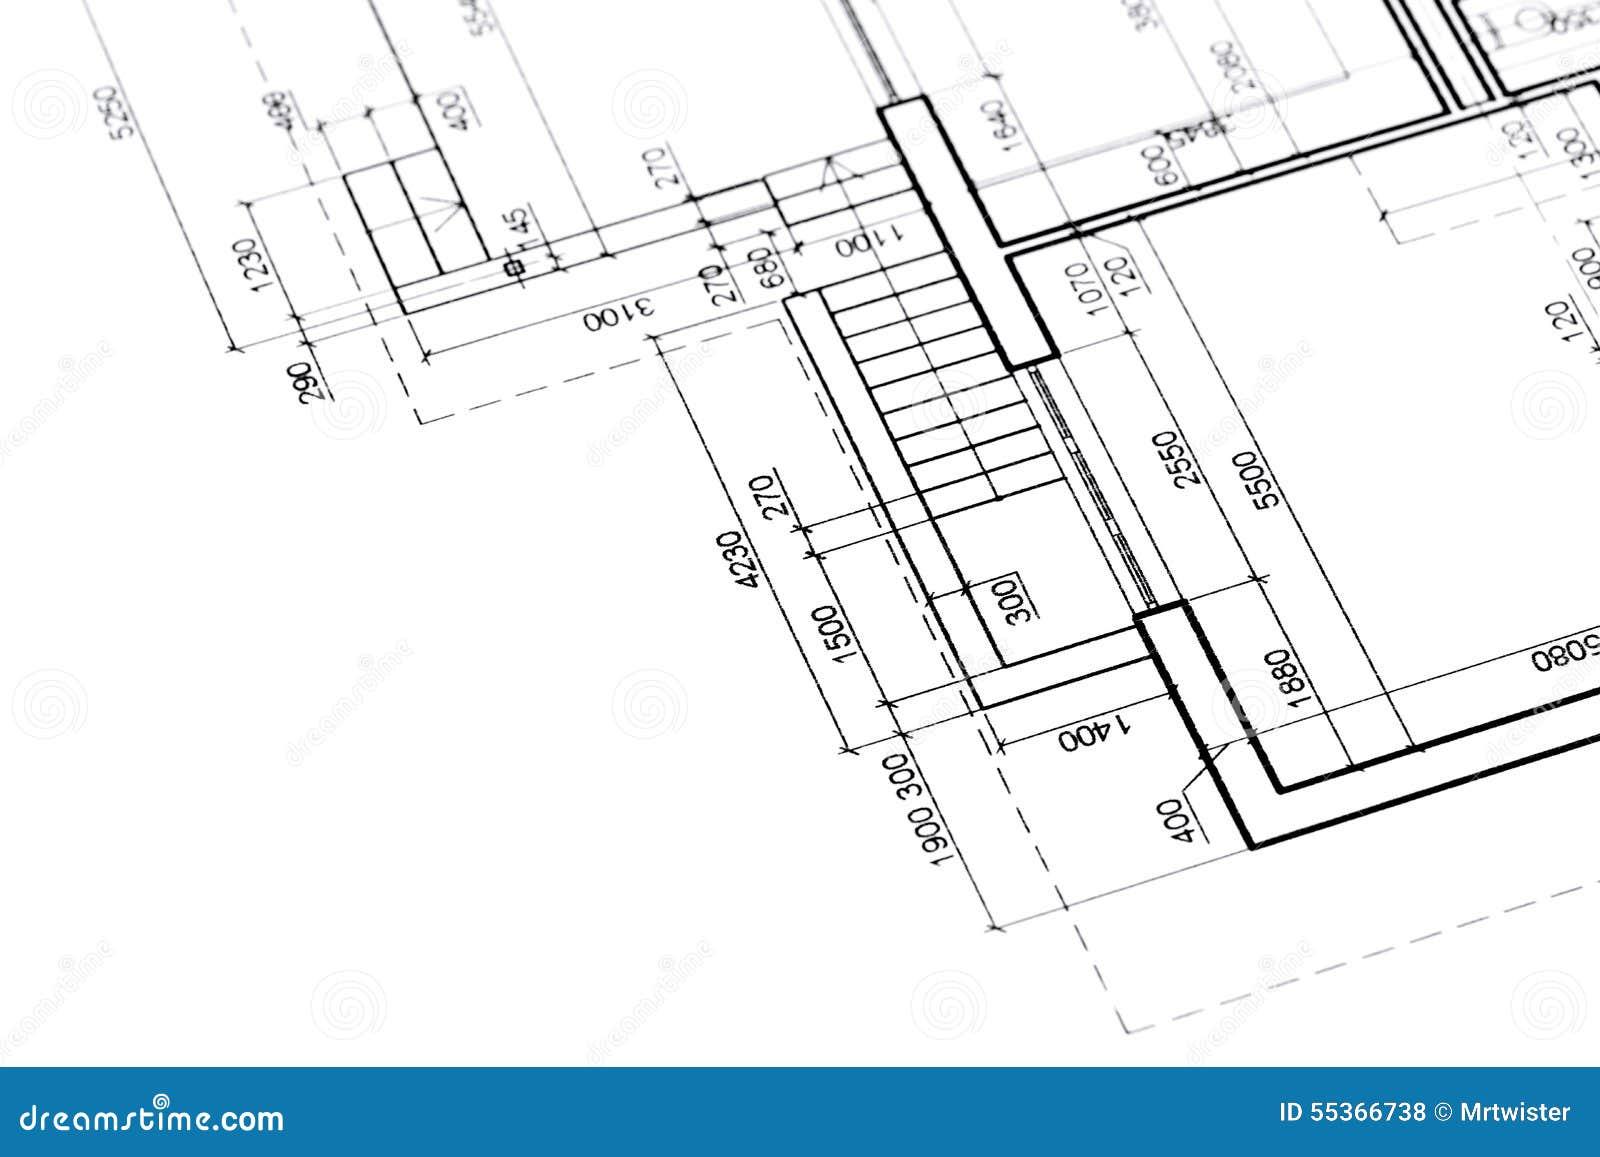 house plan blueprints closeup stock photo image 55366738 architectural closeup construction home house plan